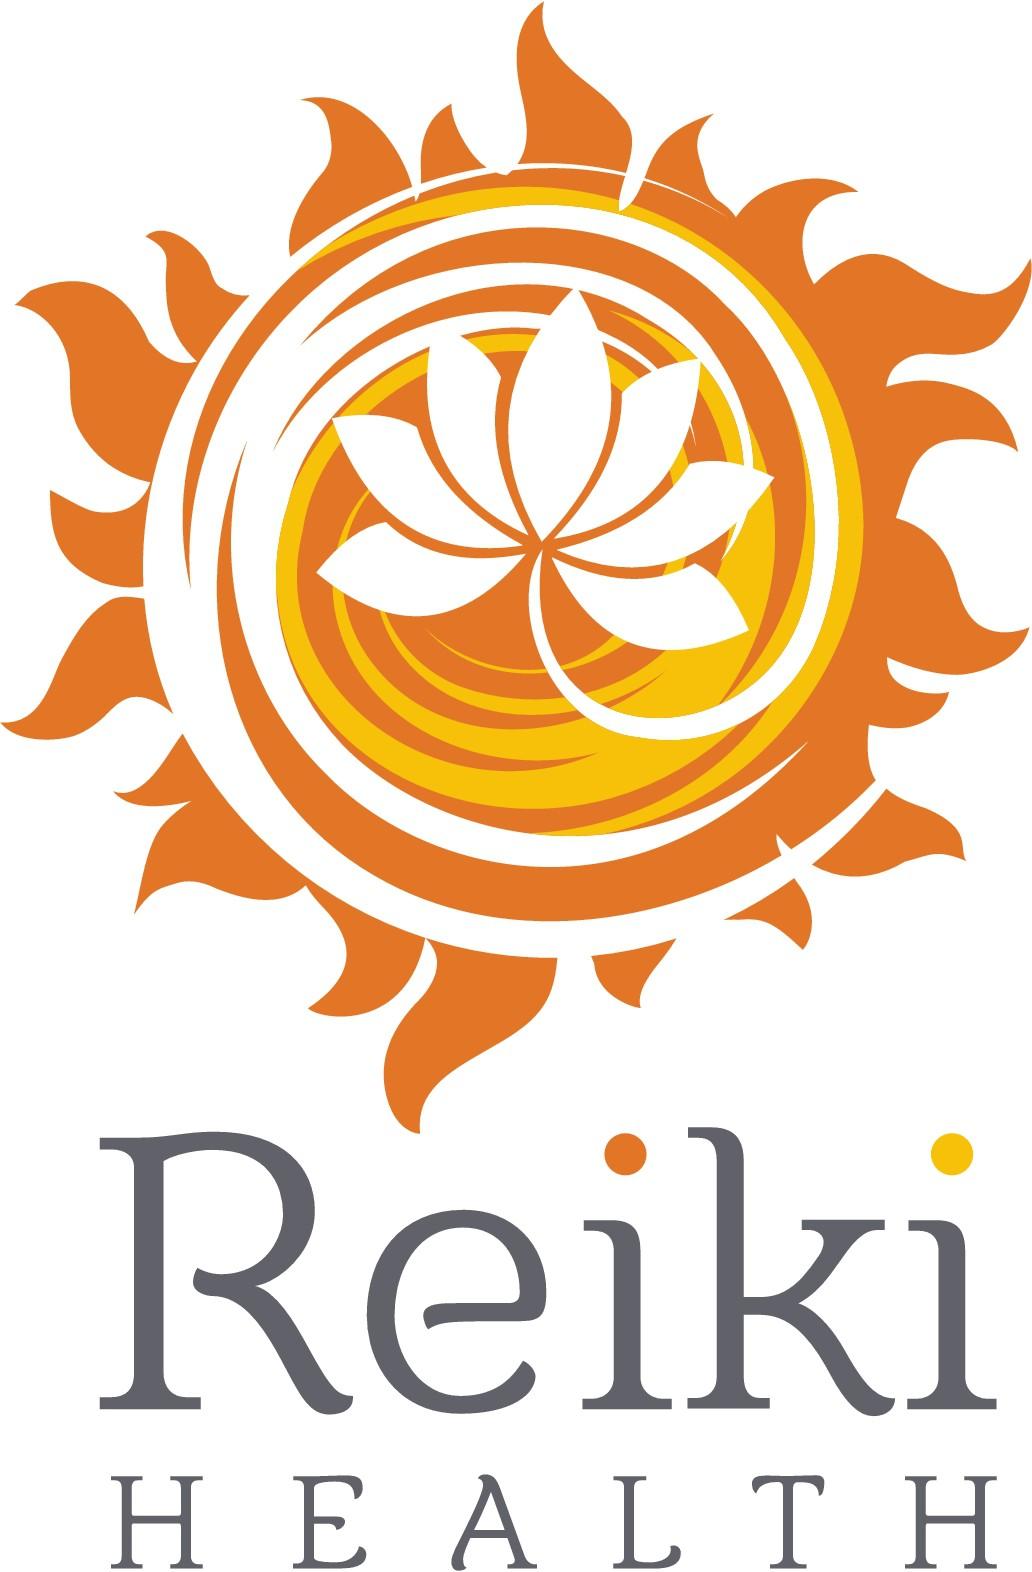 Reiki Health needs an energy infused logo